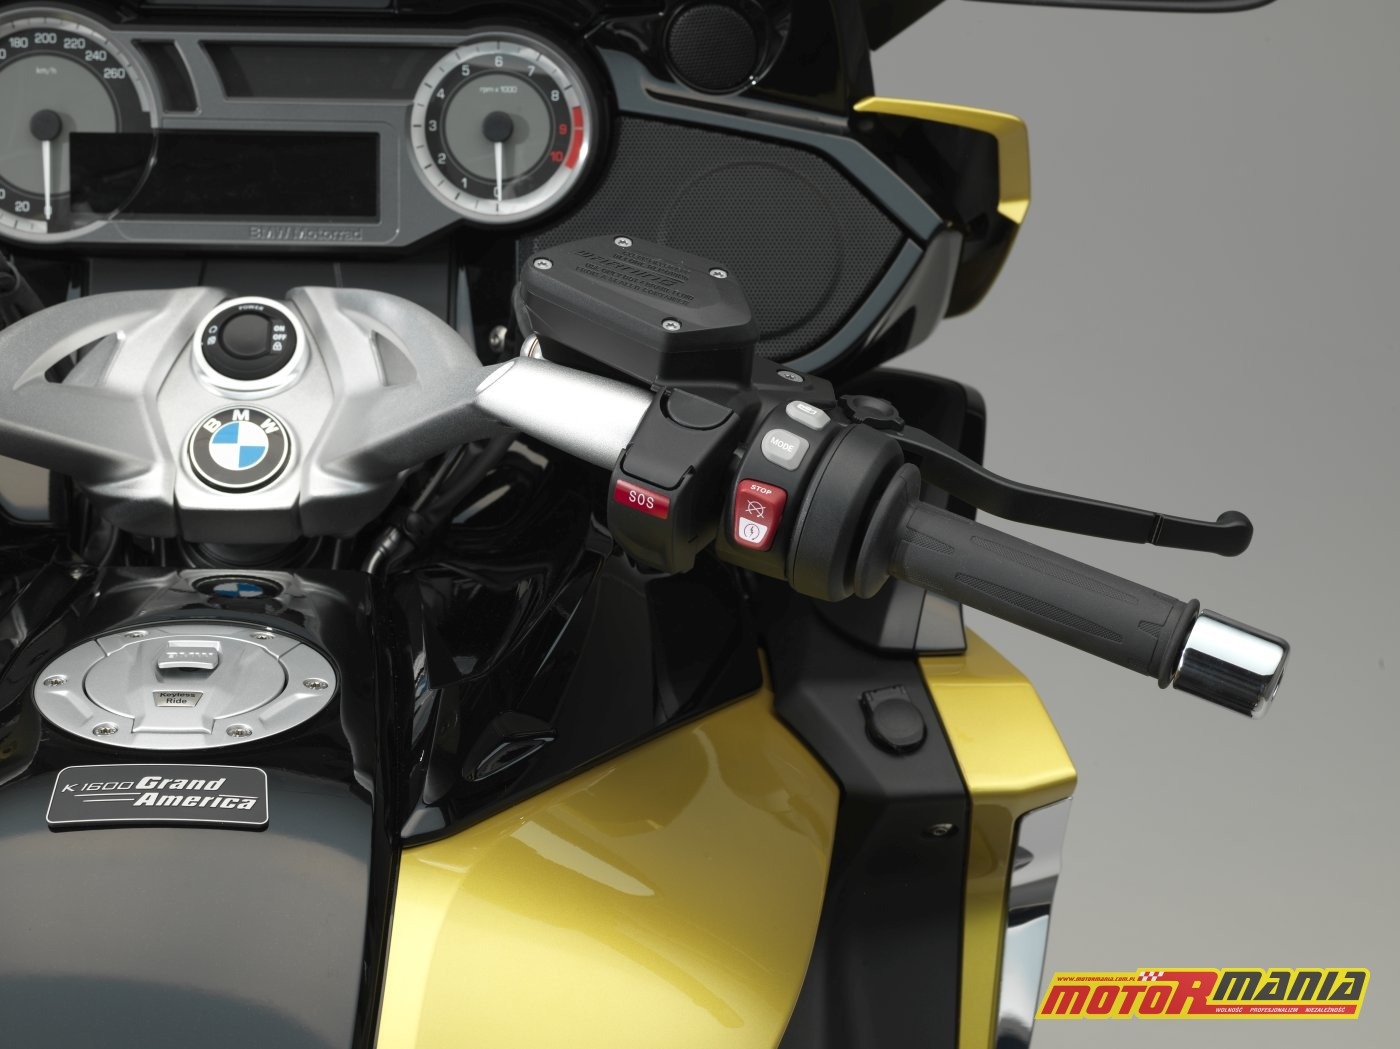 BMW K1600 Grand America 2018 (11)